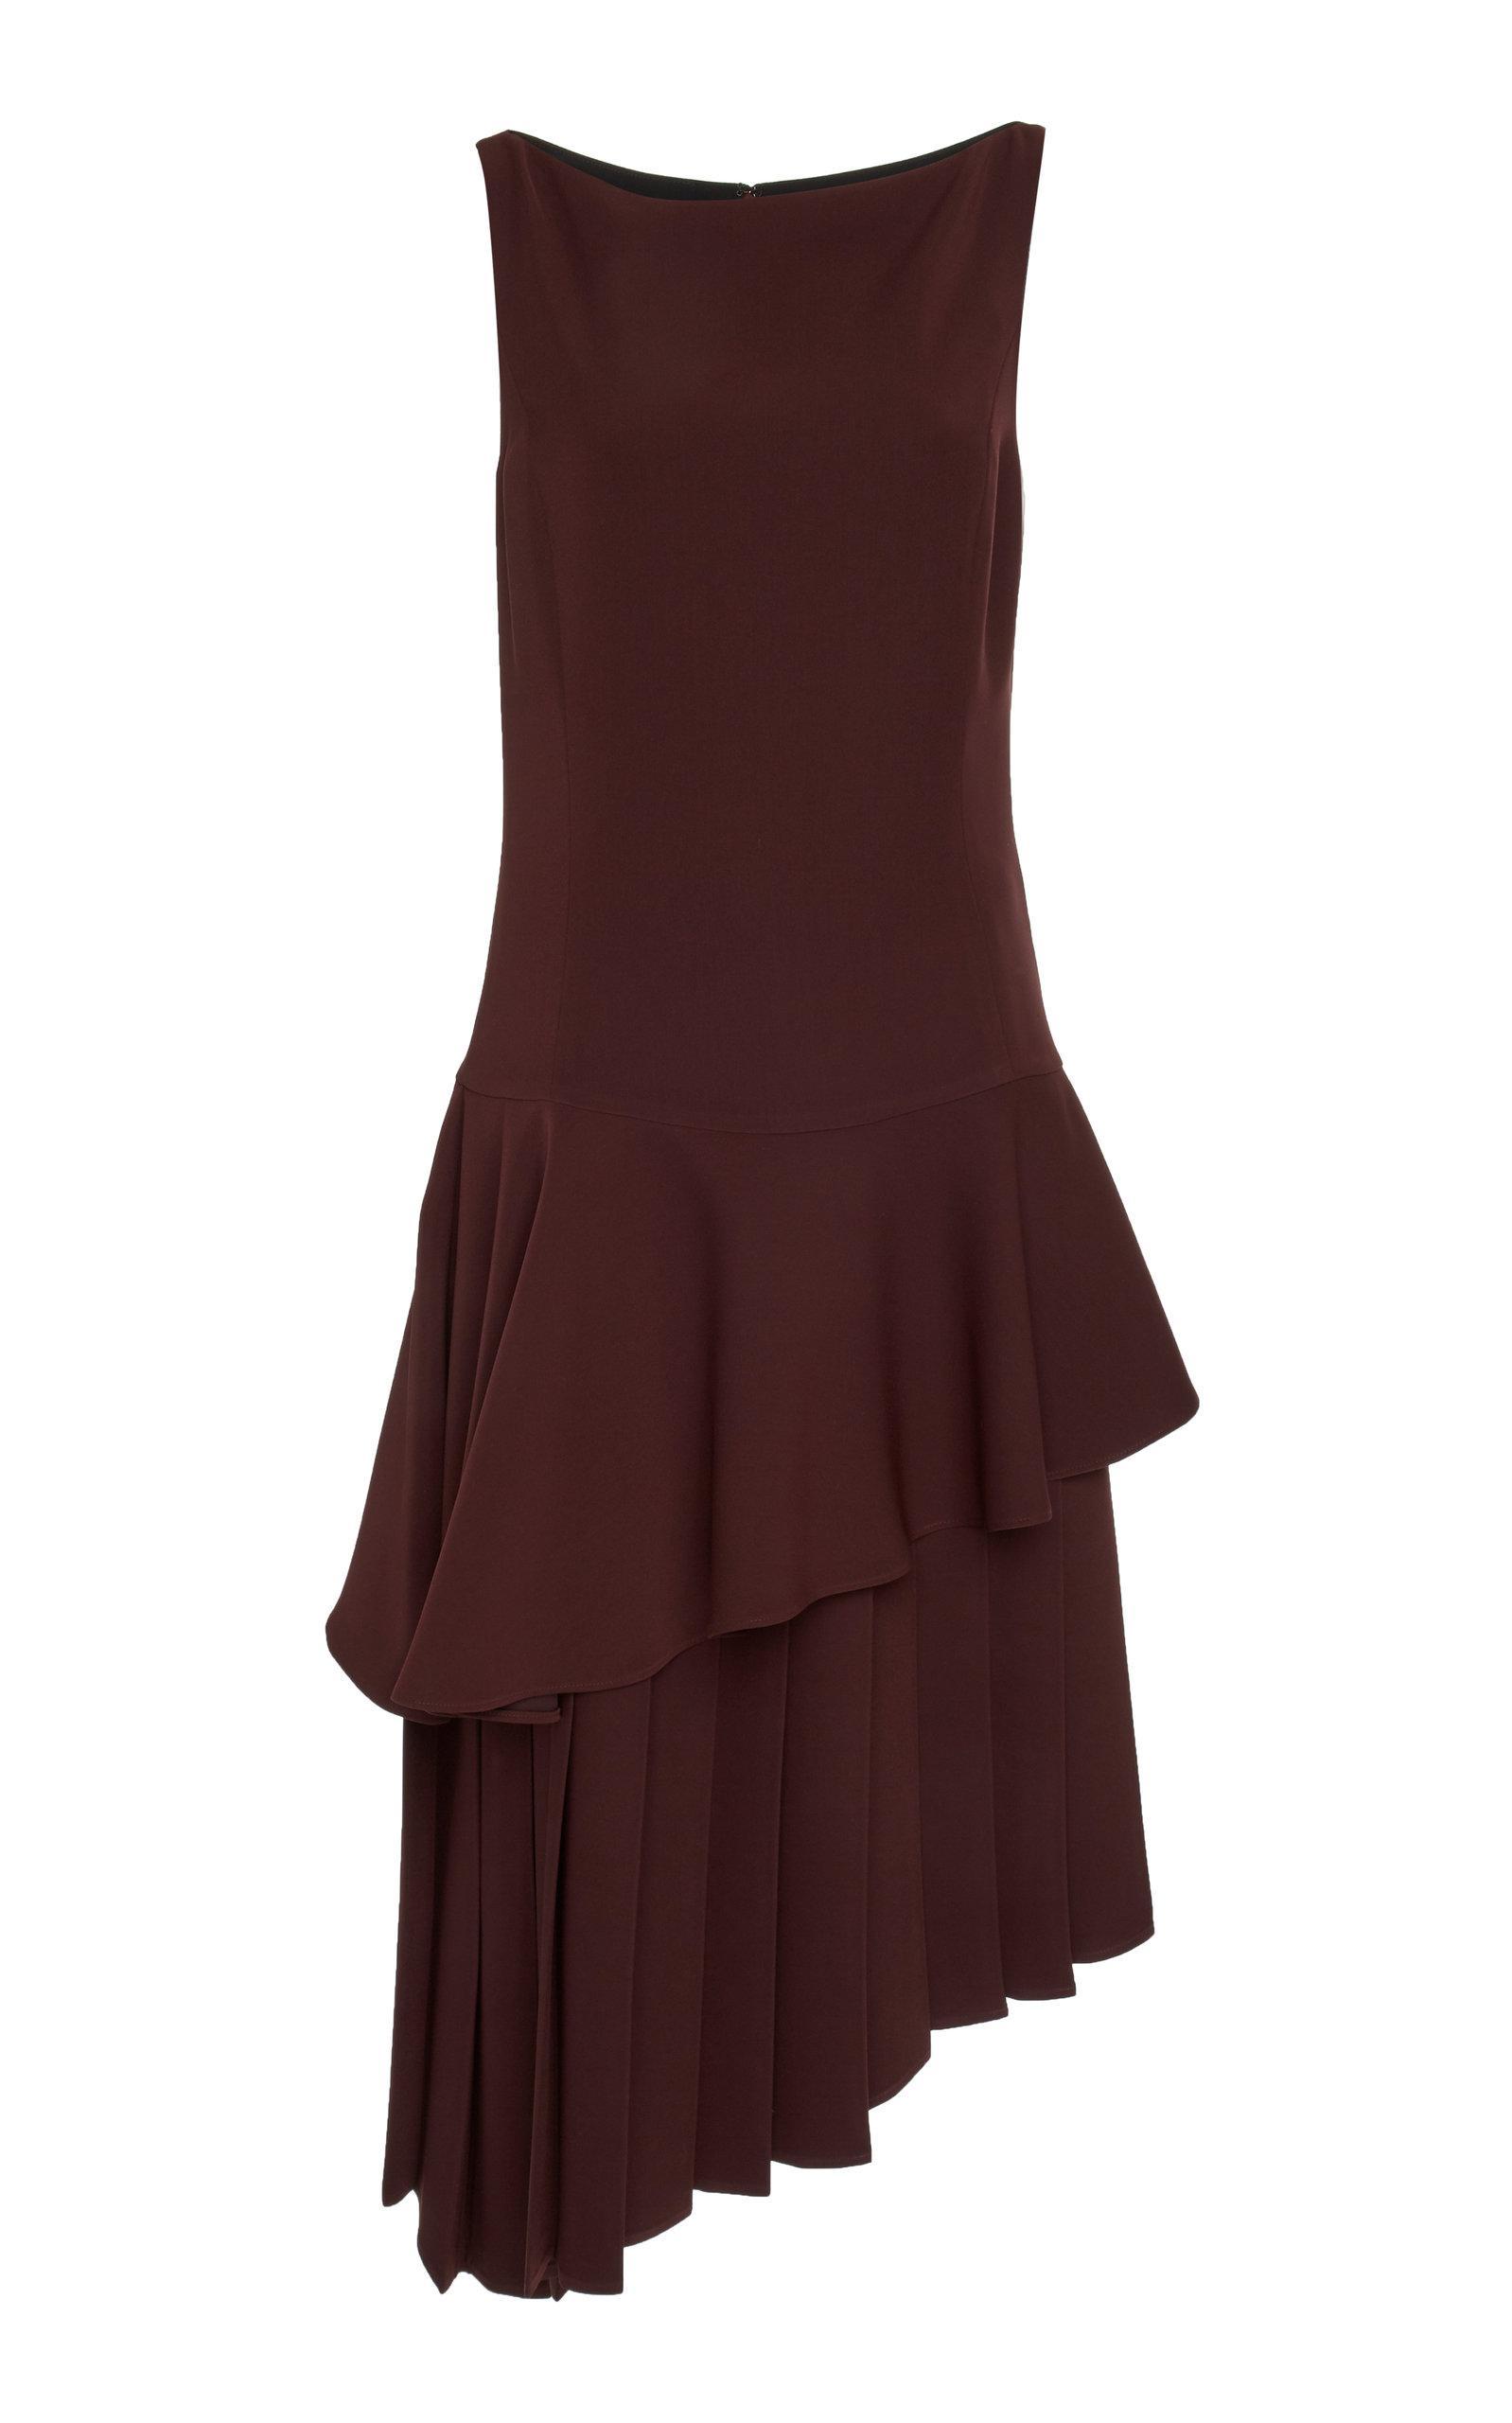 Adeam Pleated Moga Dress In Burgundy